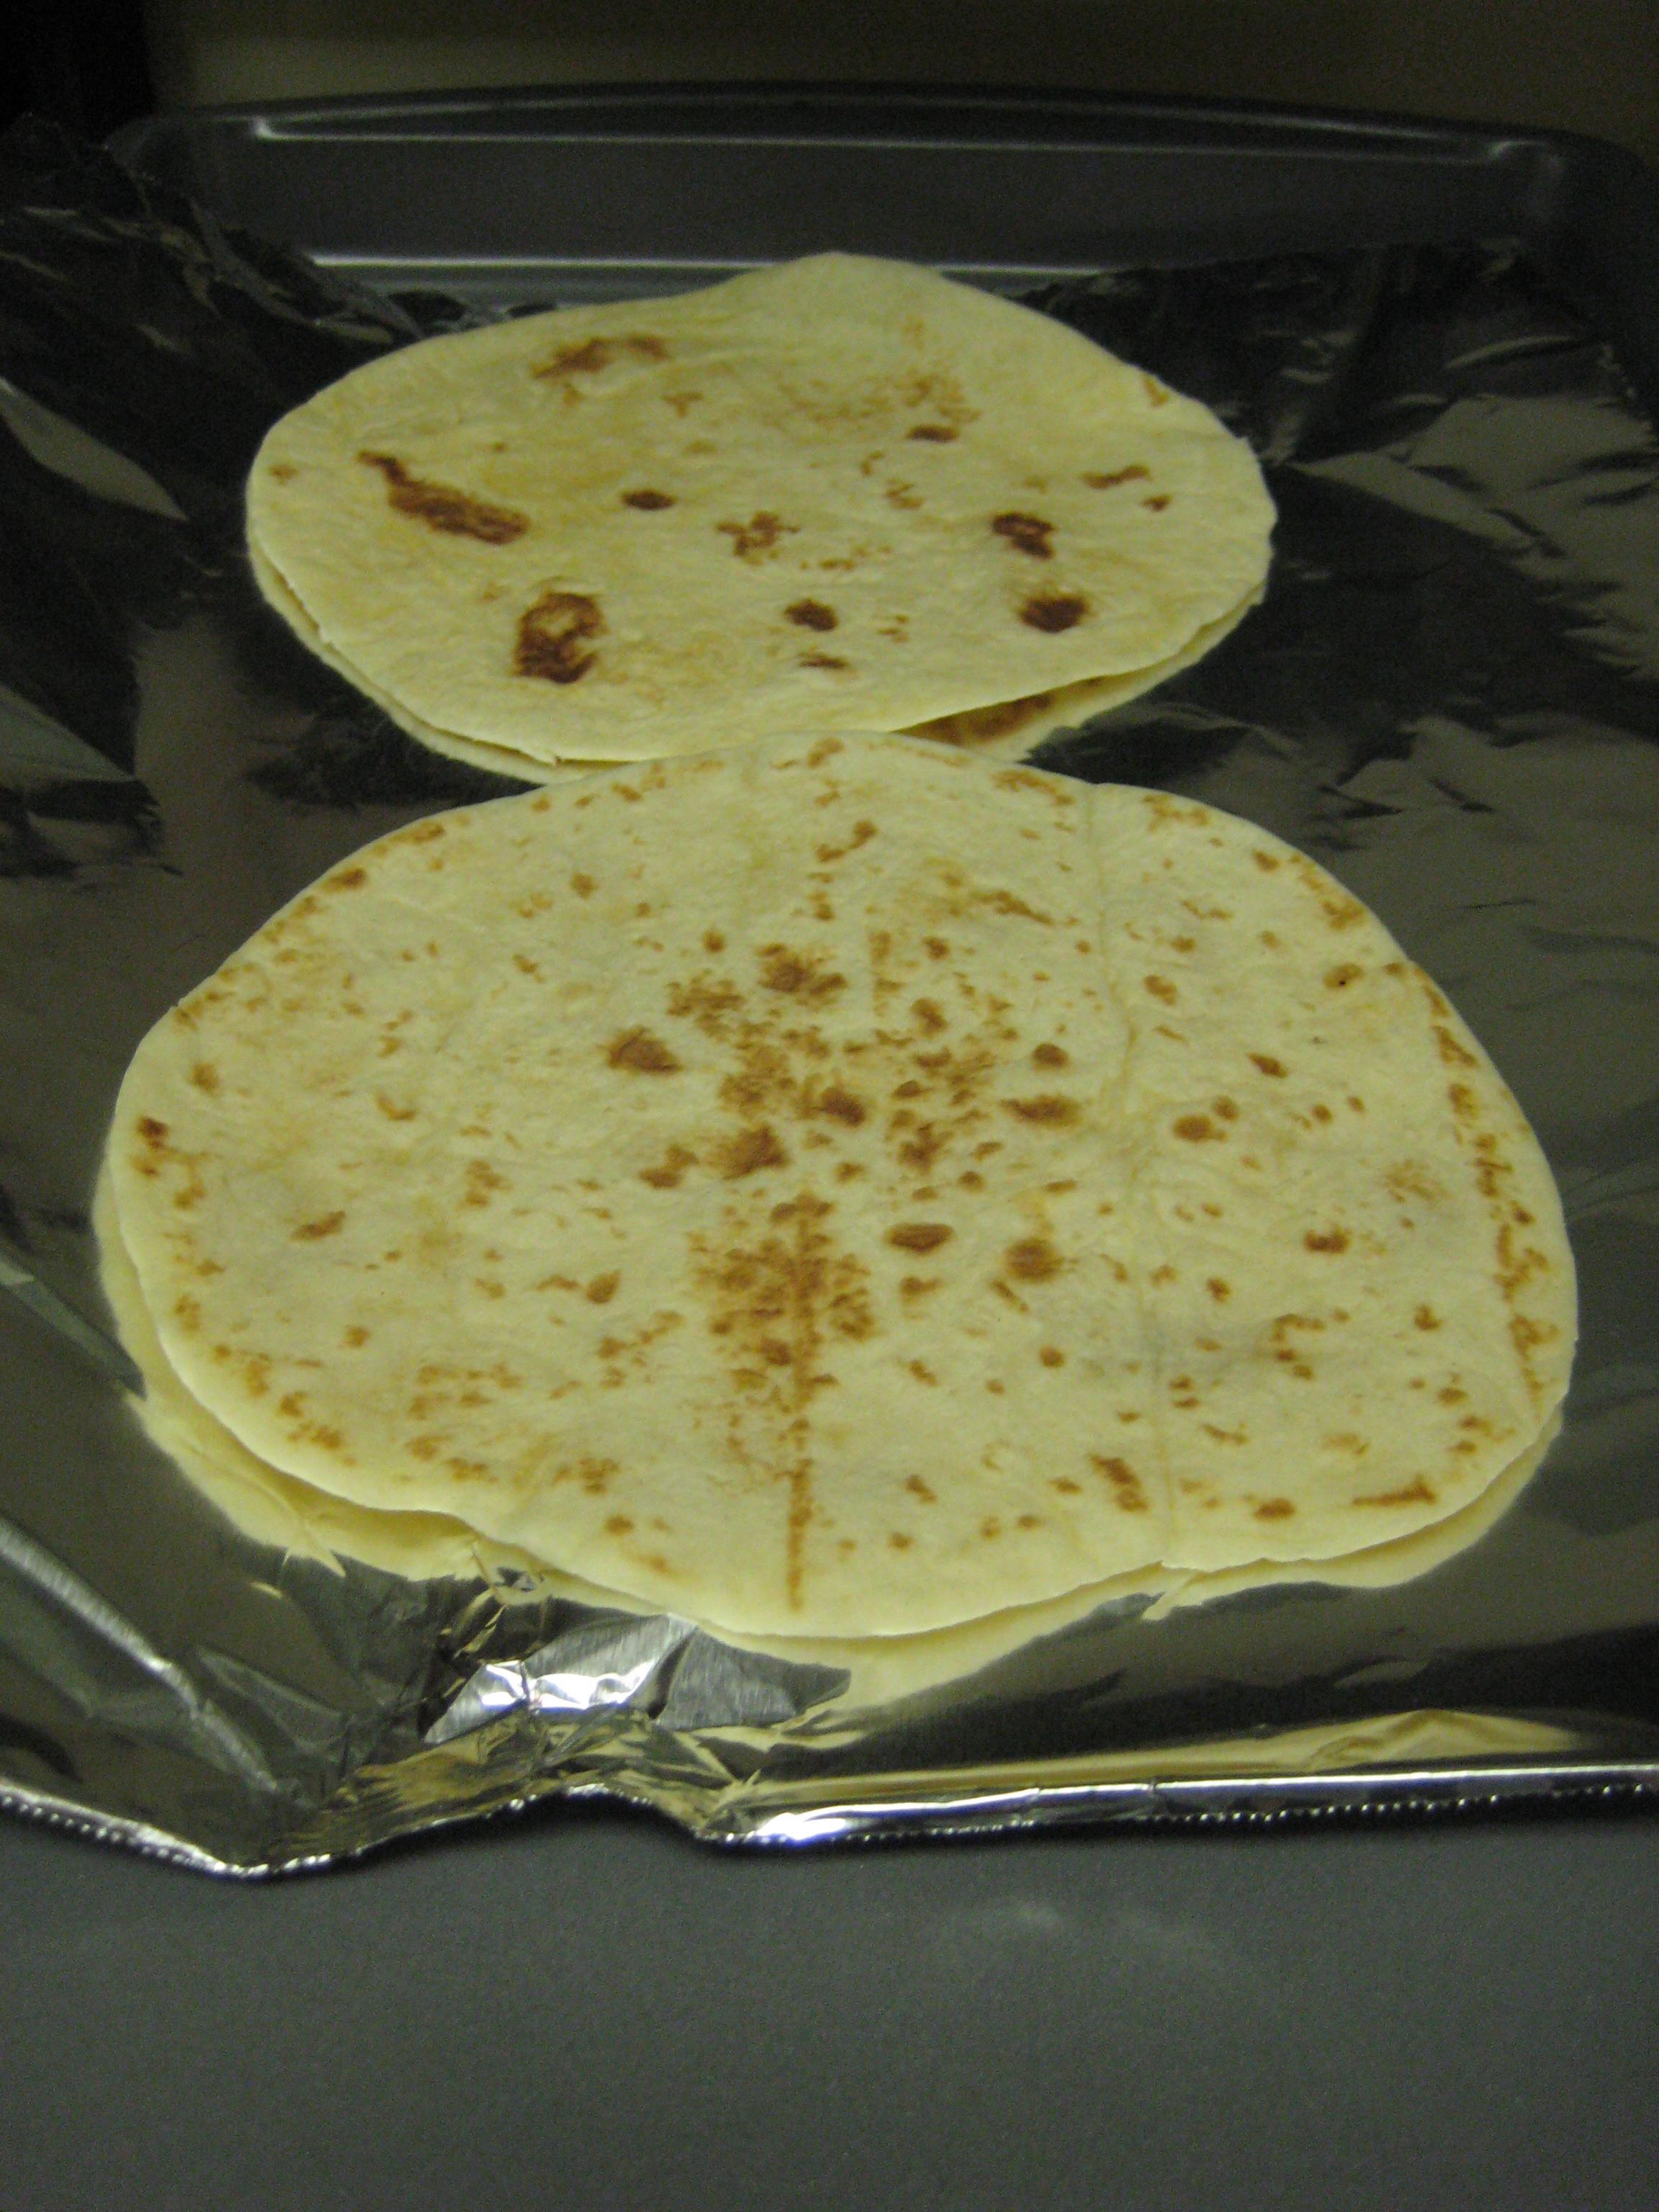 Pre bake the tortillas to make them crisp.